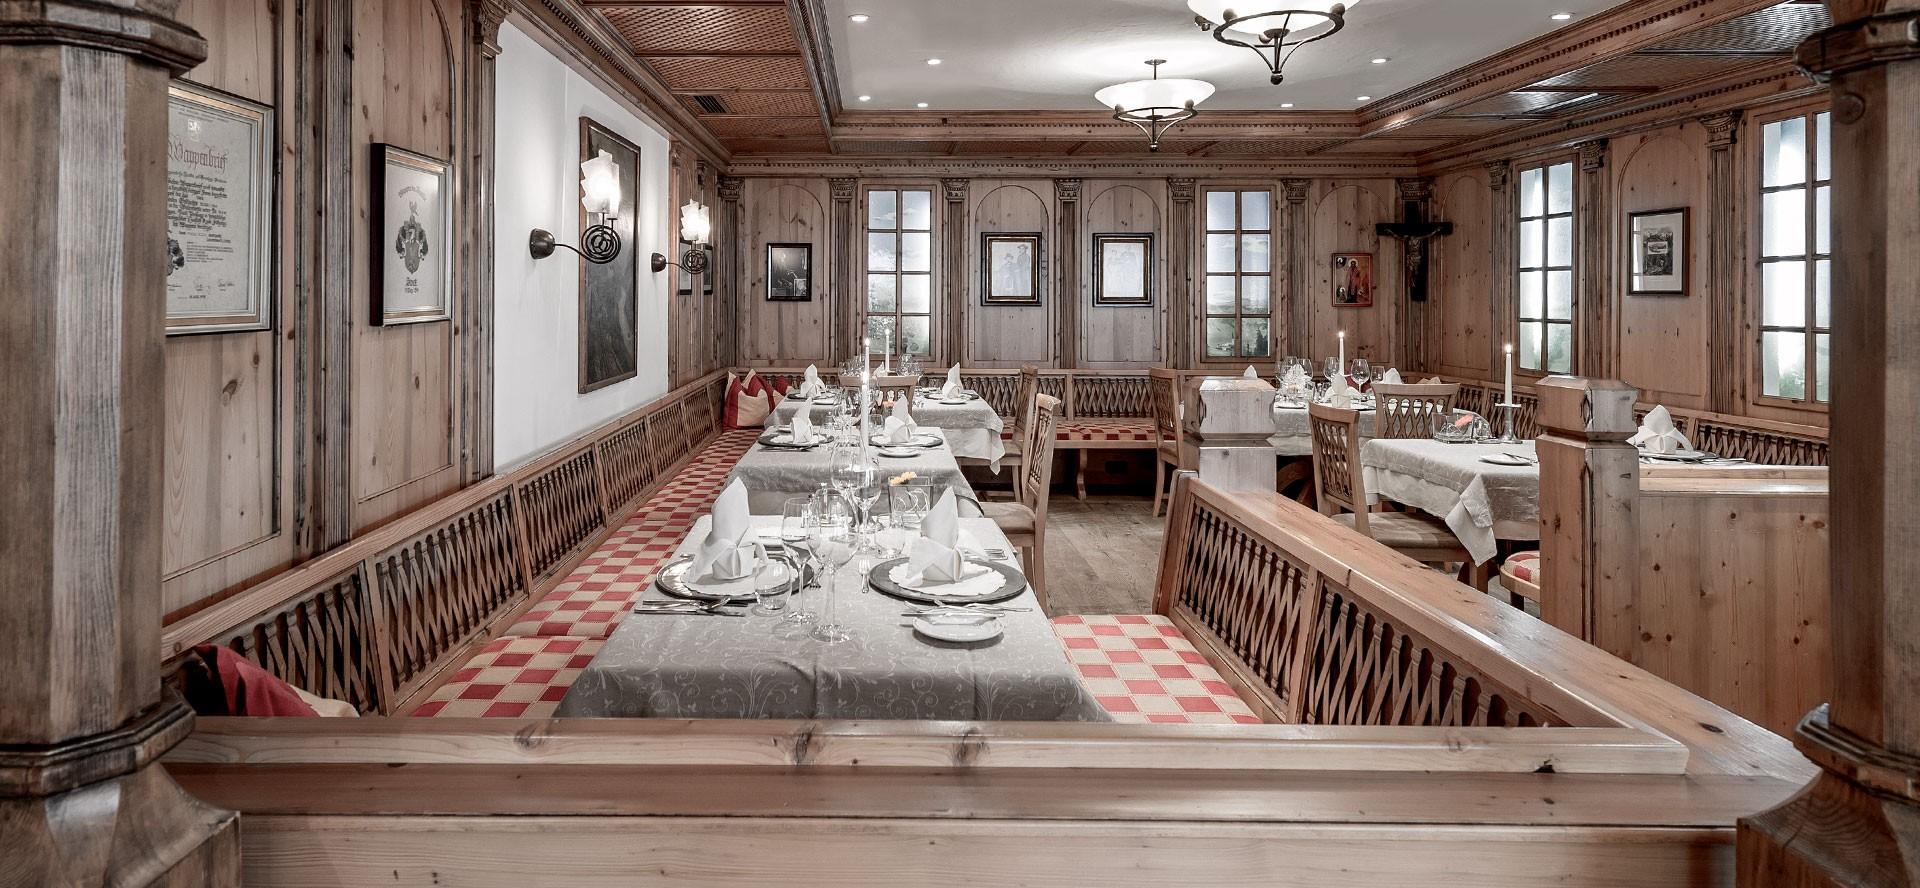 Bergfried Hotel Zillertal